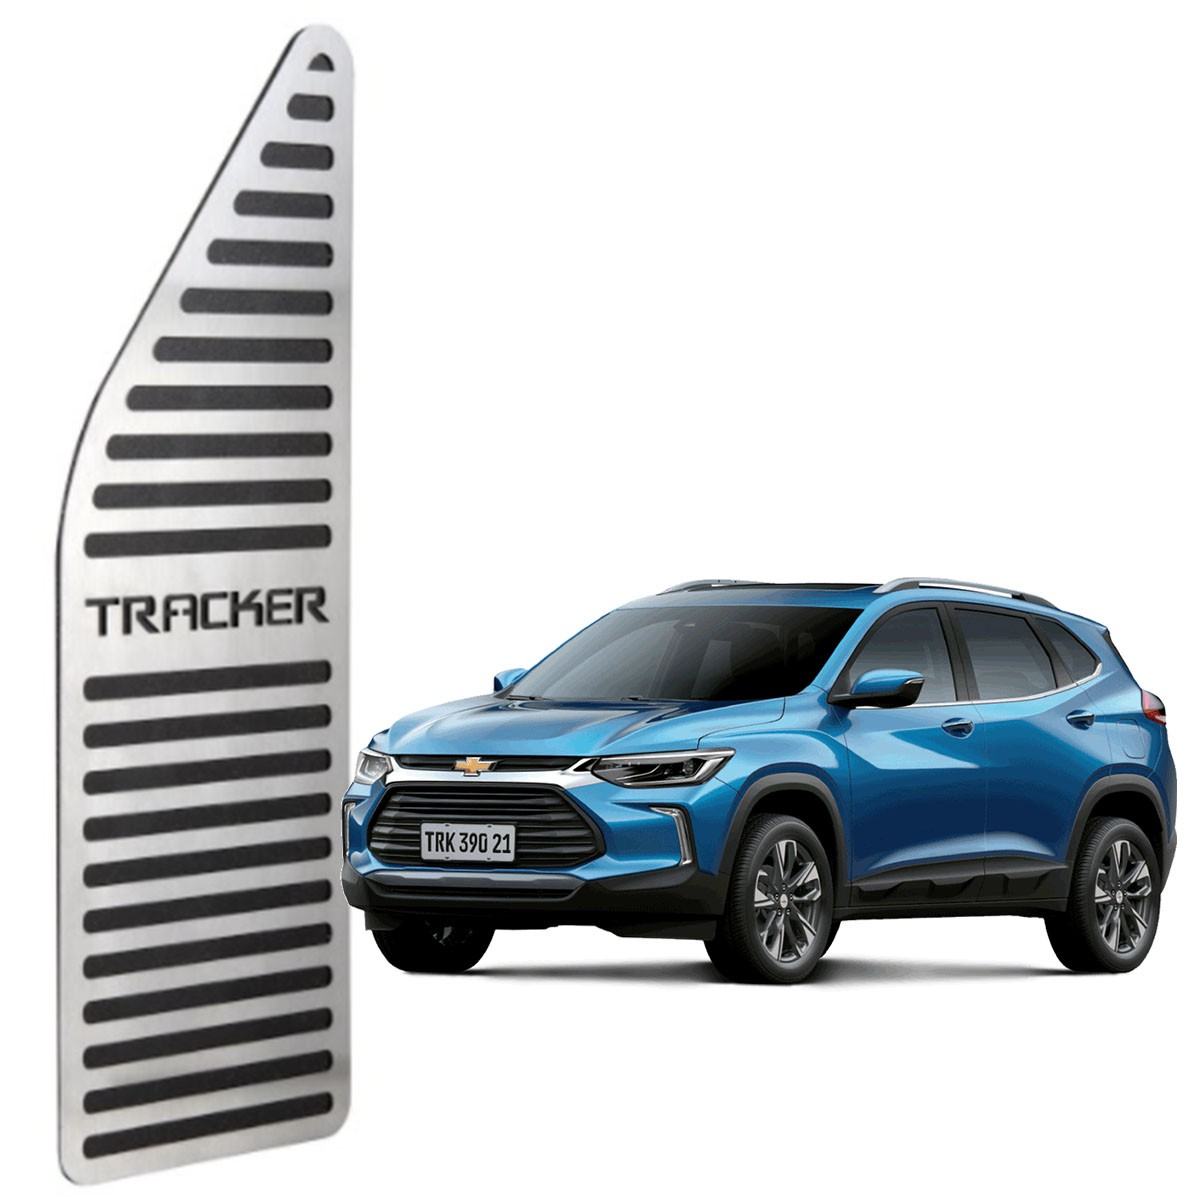 Descanso de Pé Chevrolet Tracker Aço Inox Escovado